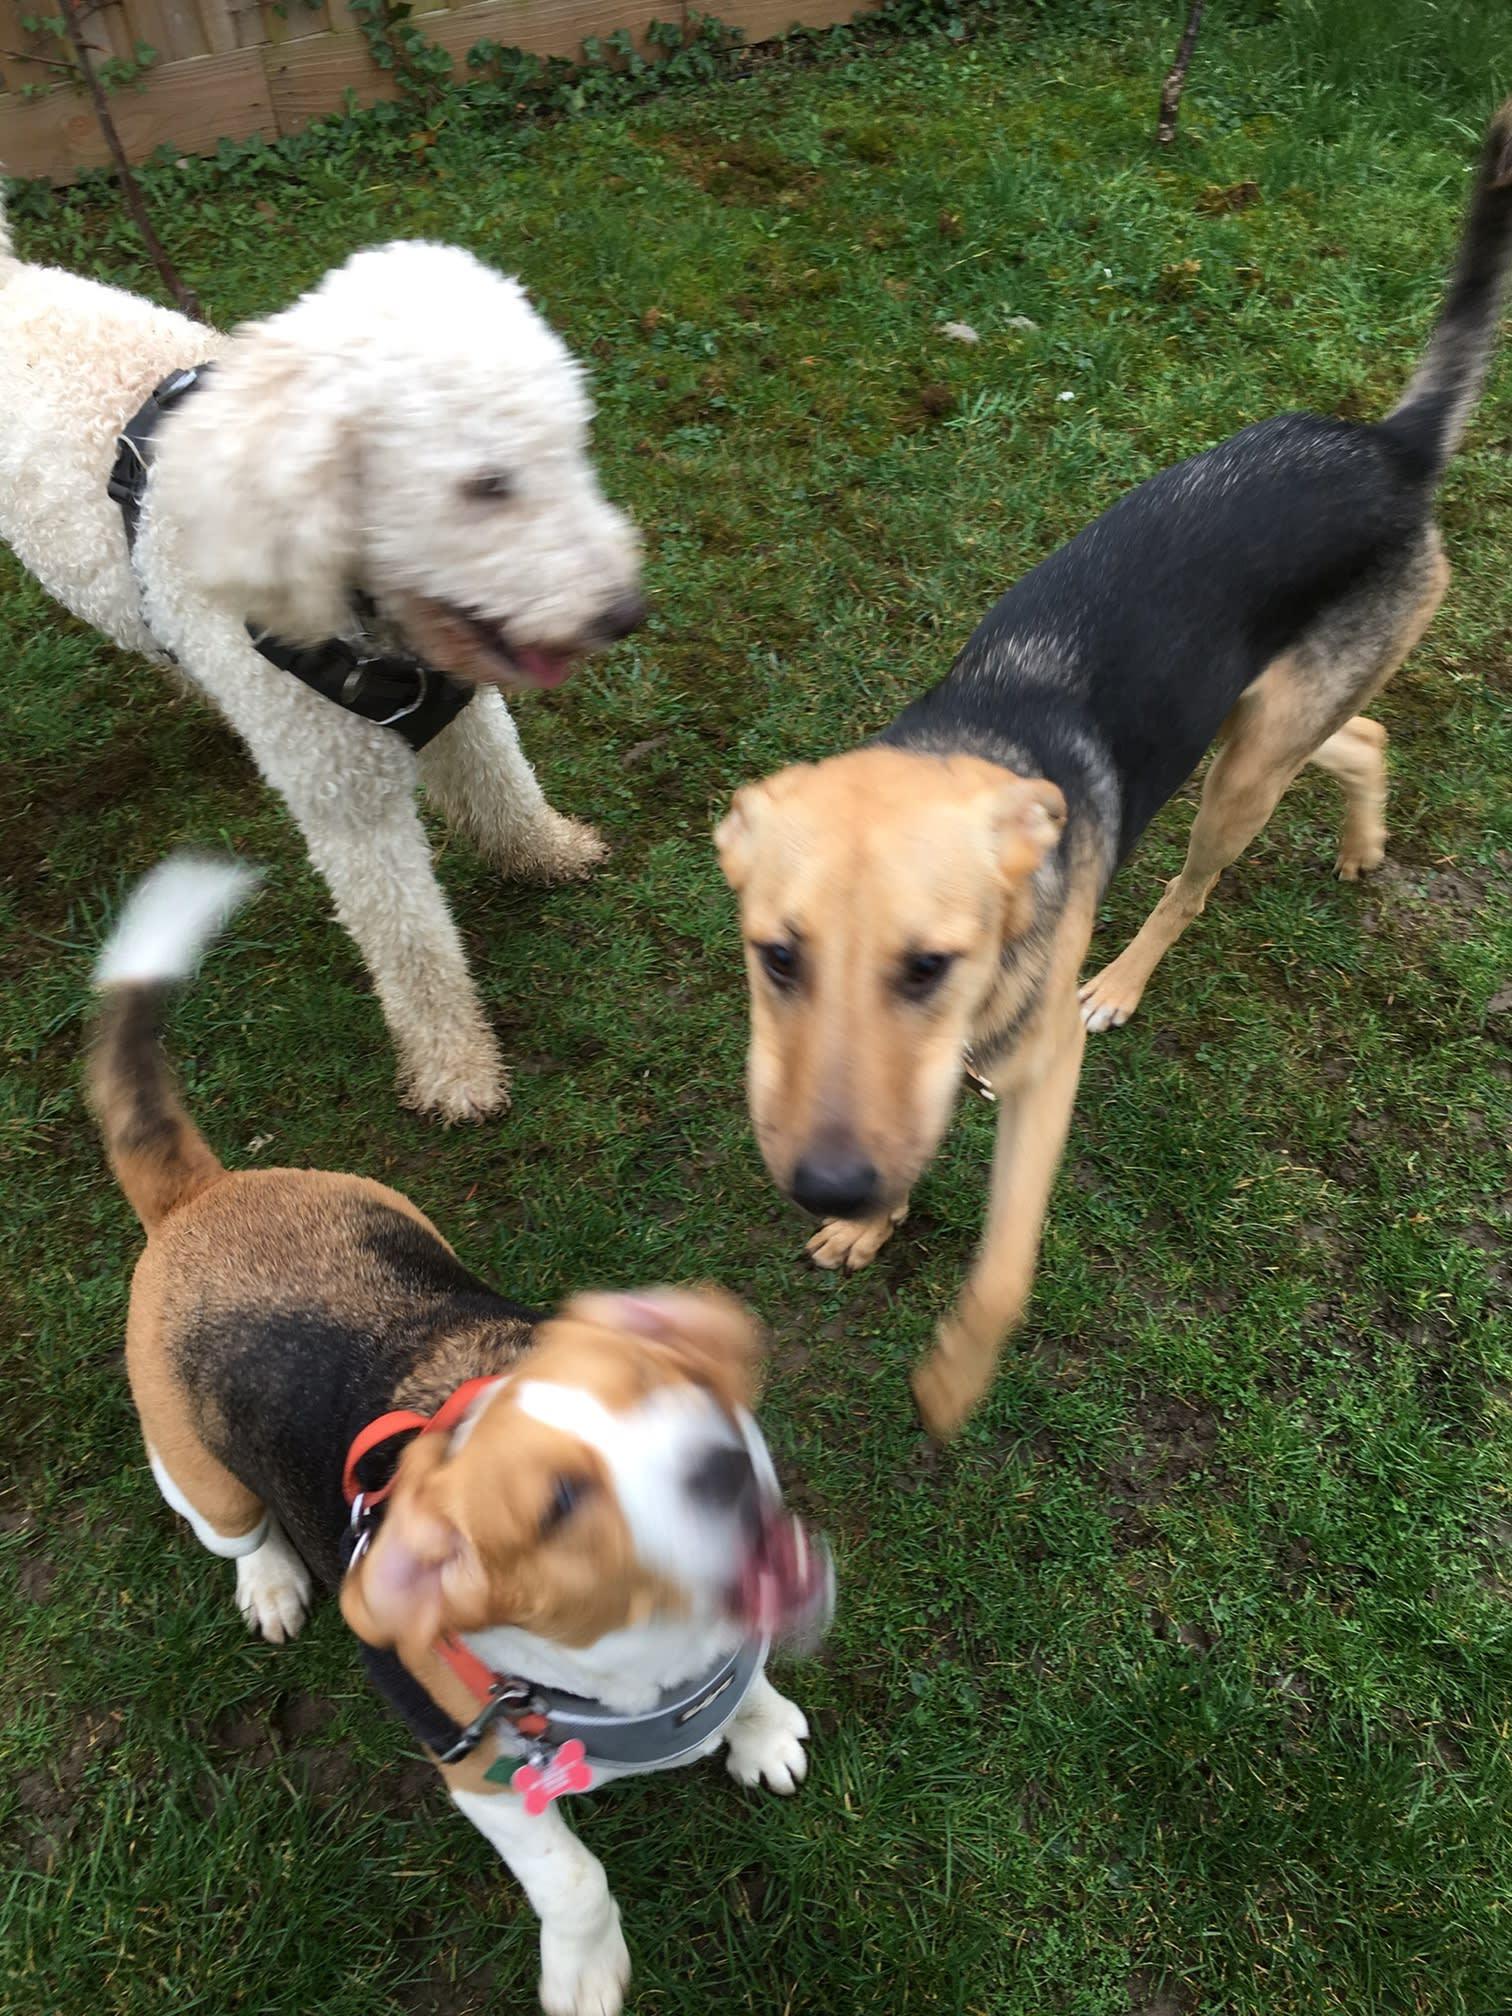 Dog Walking & Pet Sitting | 185 Howard St, Oxford OX4 3BB | +44 7414 666687